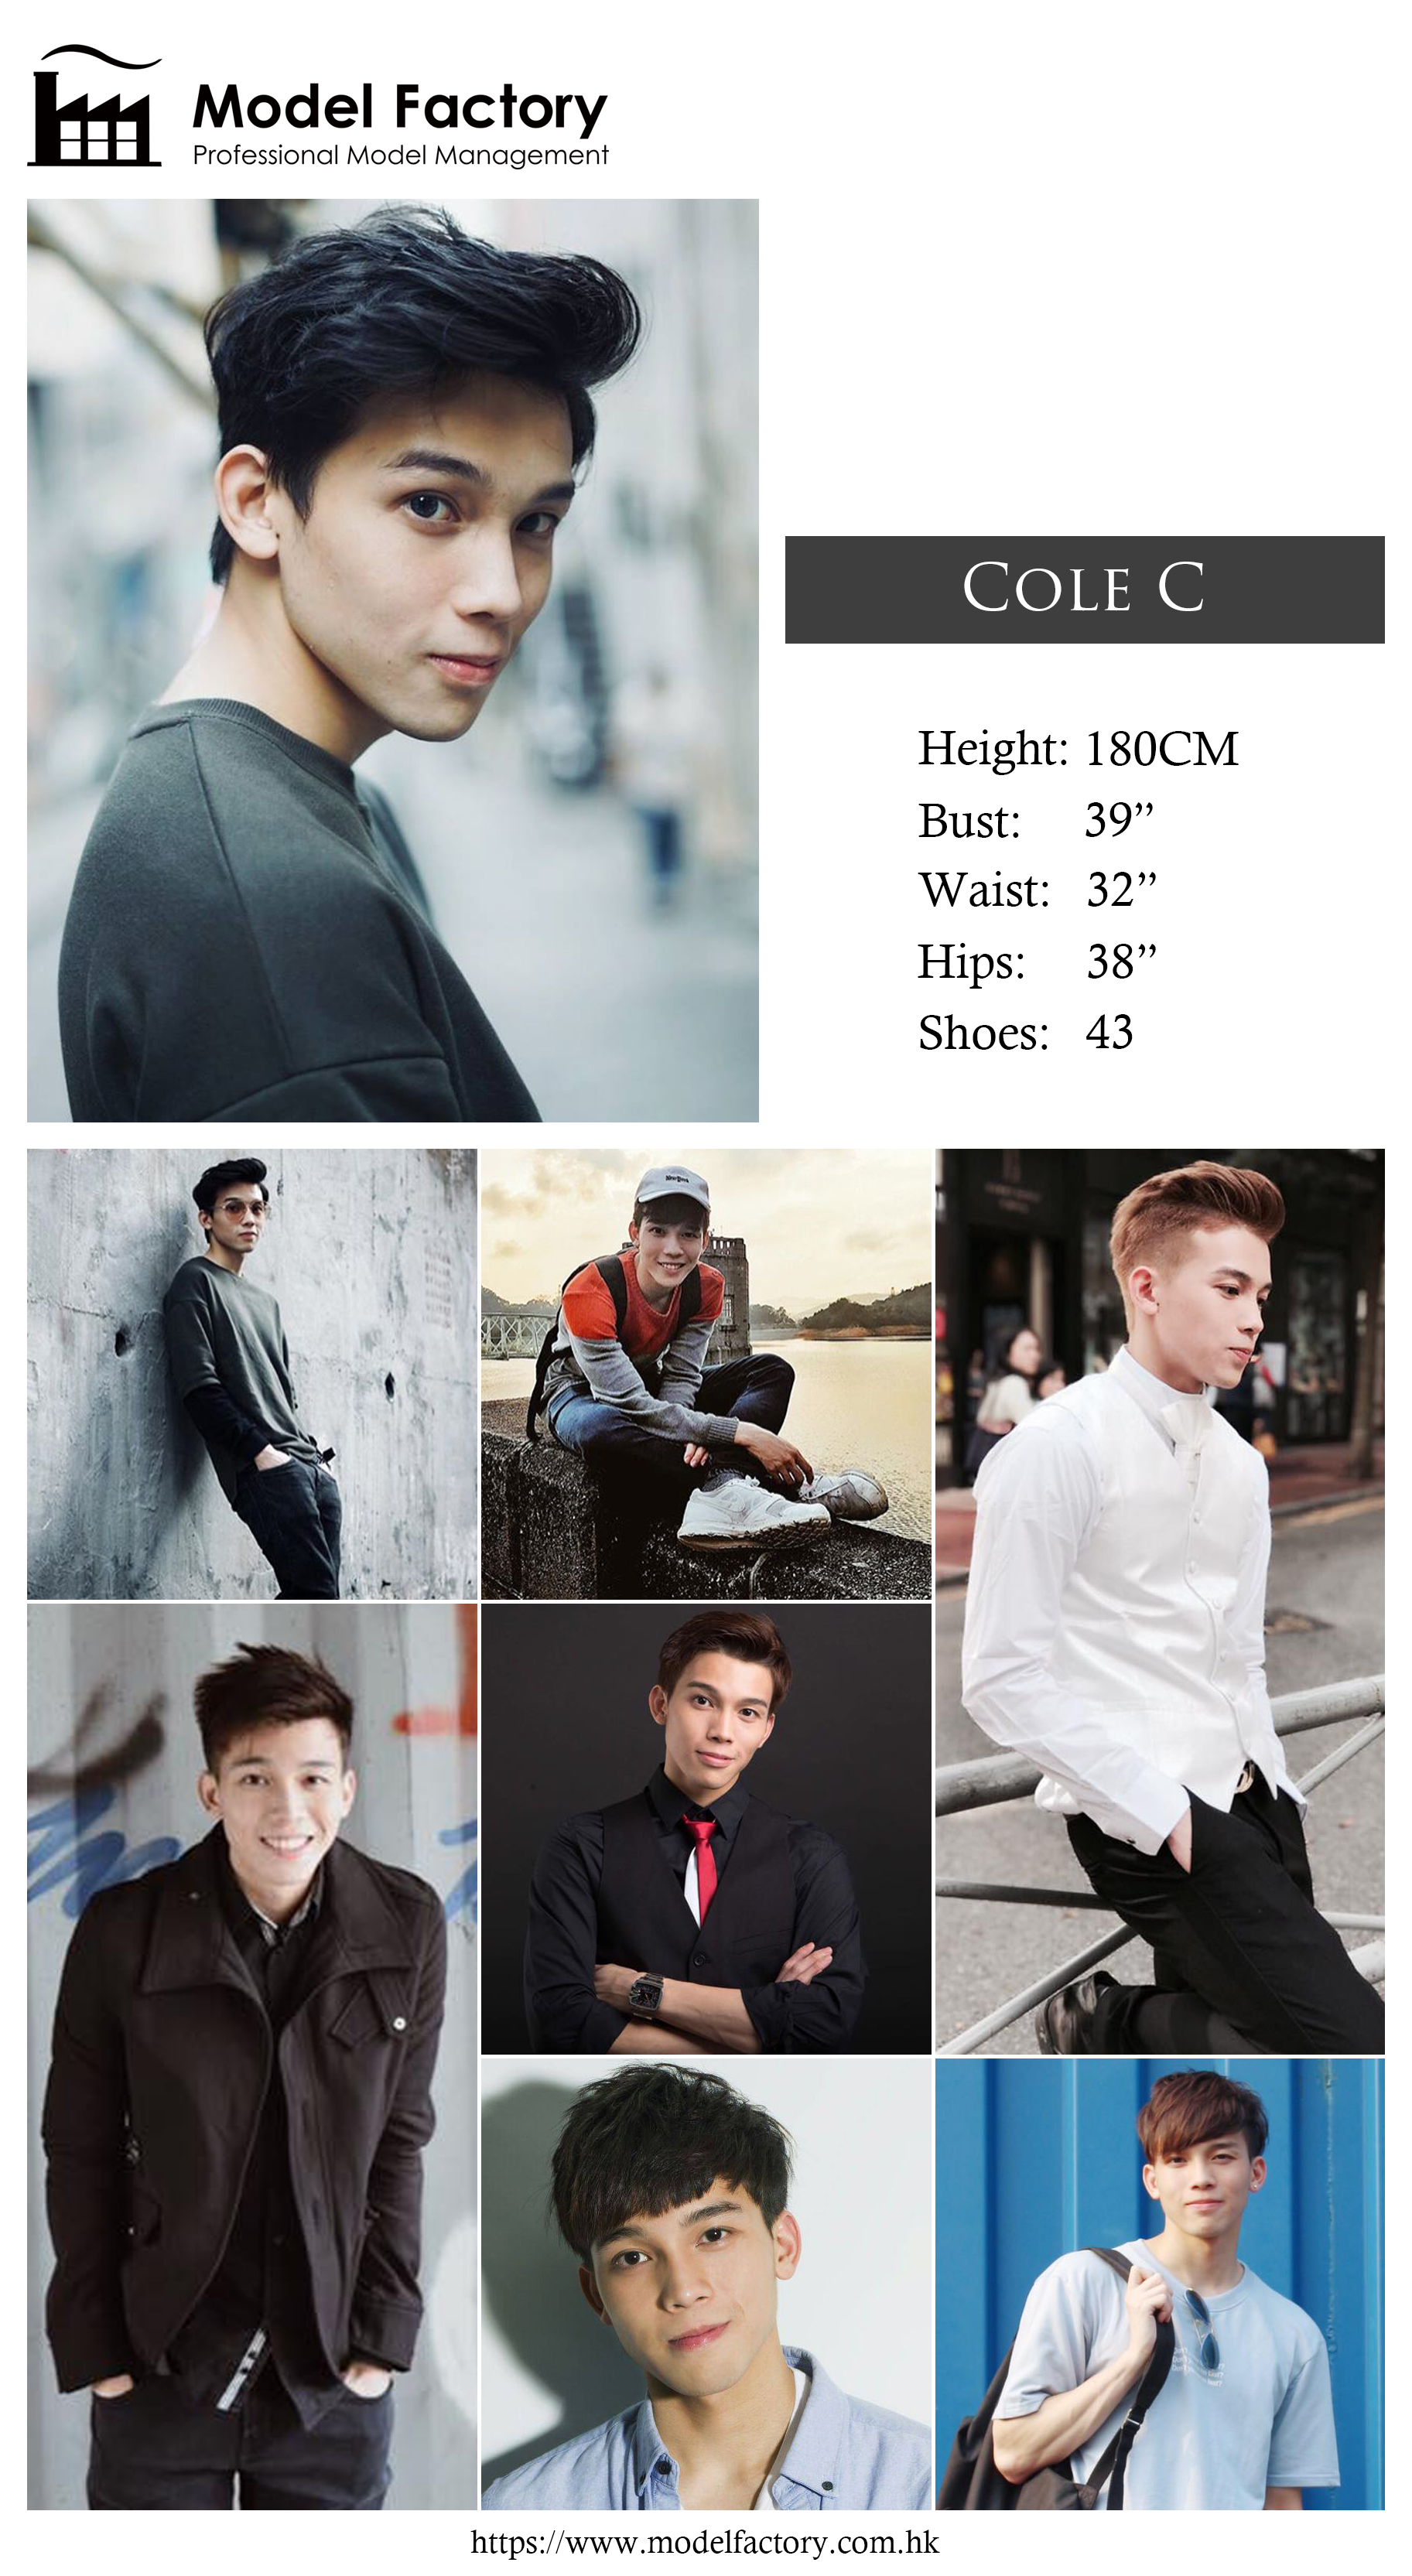 Model Factory Hong Kong Male Model ColeC